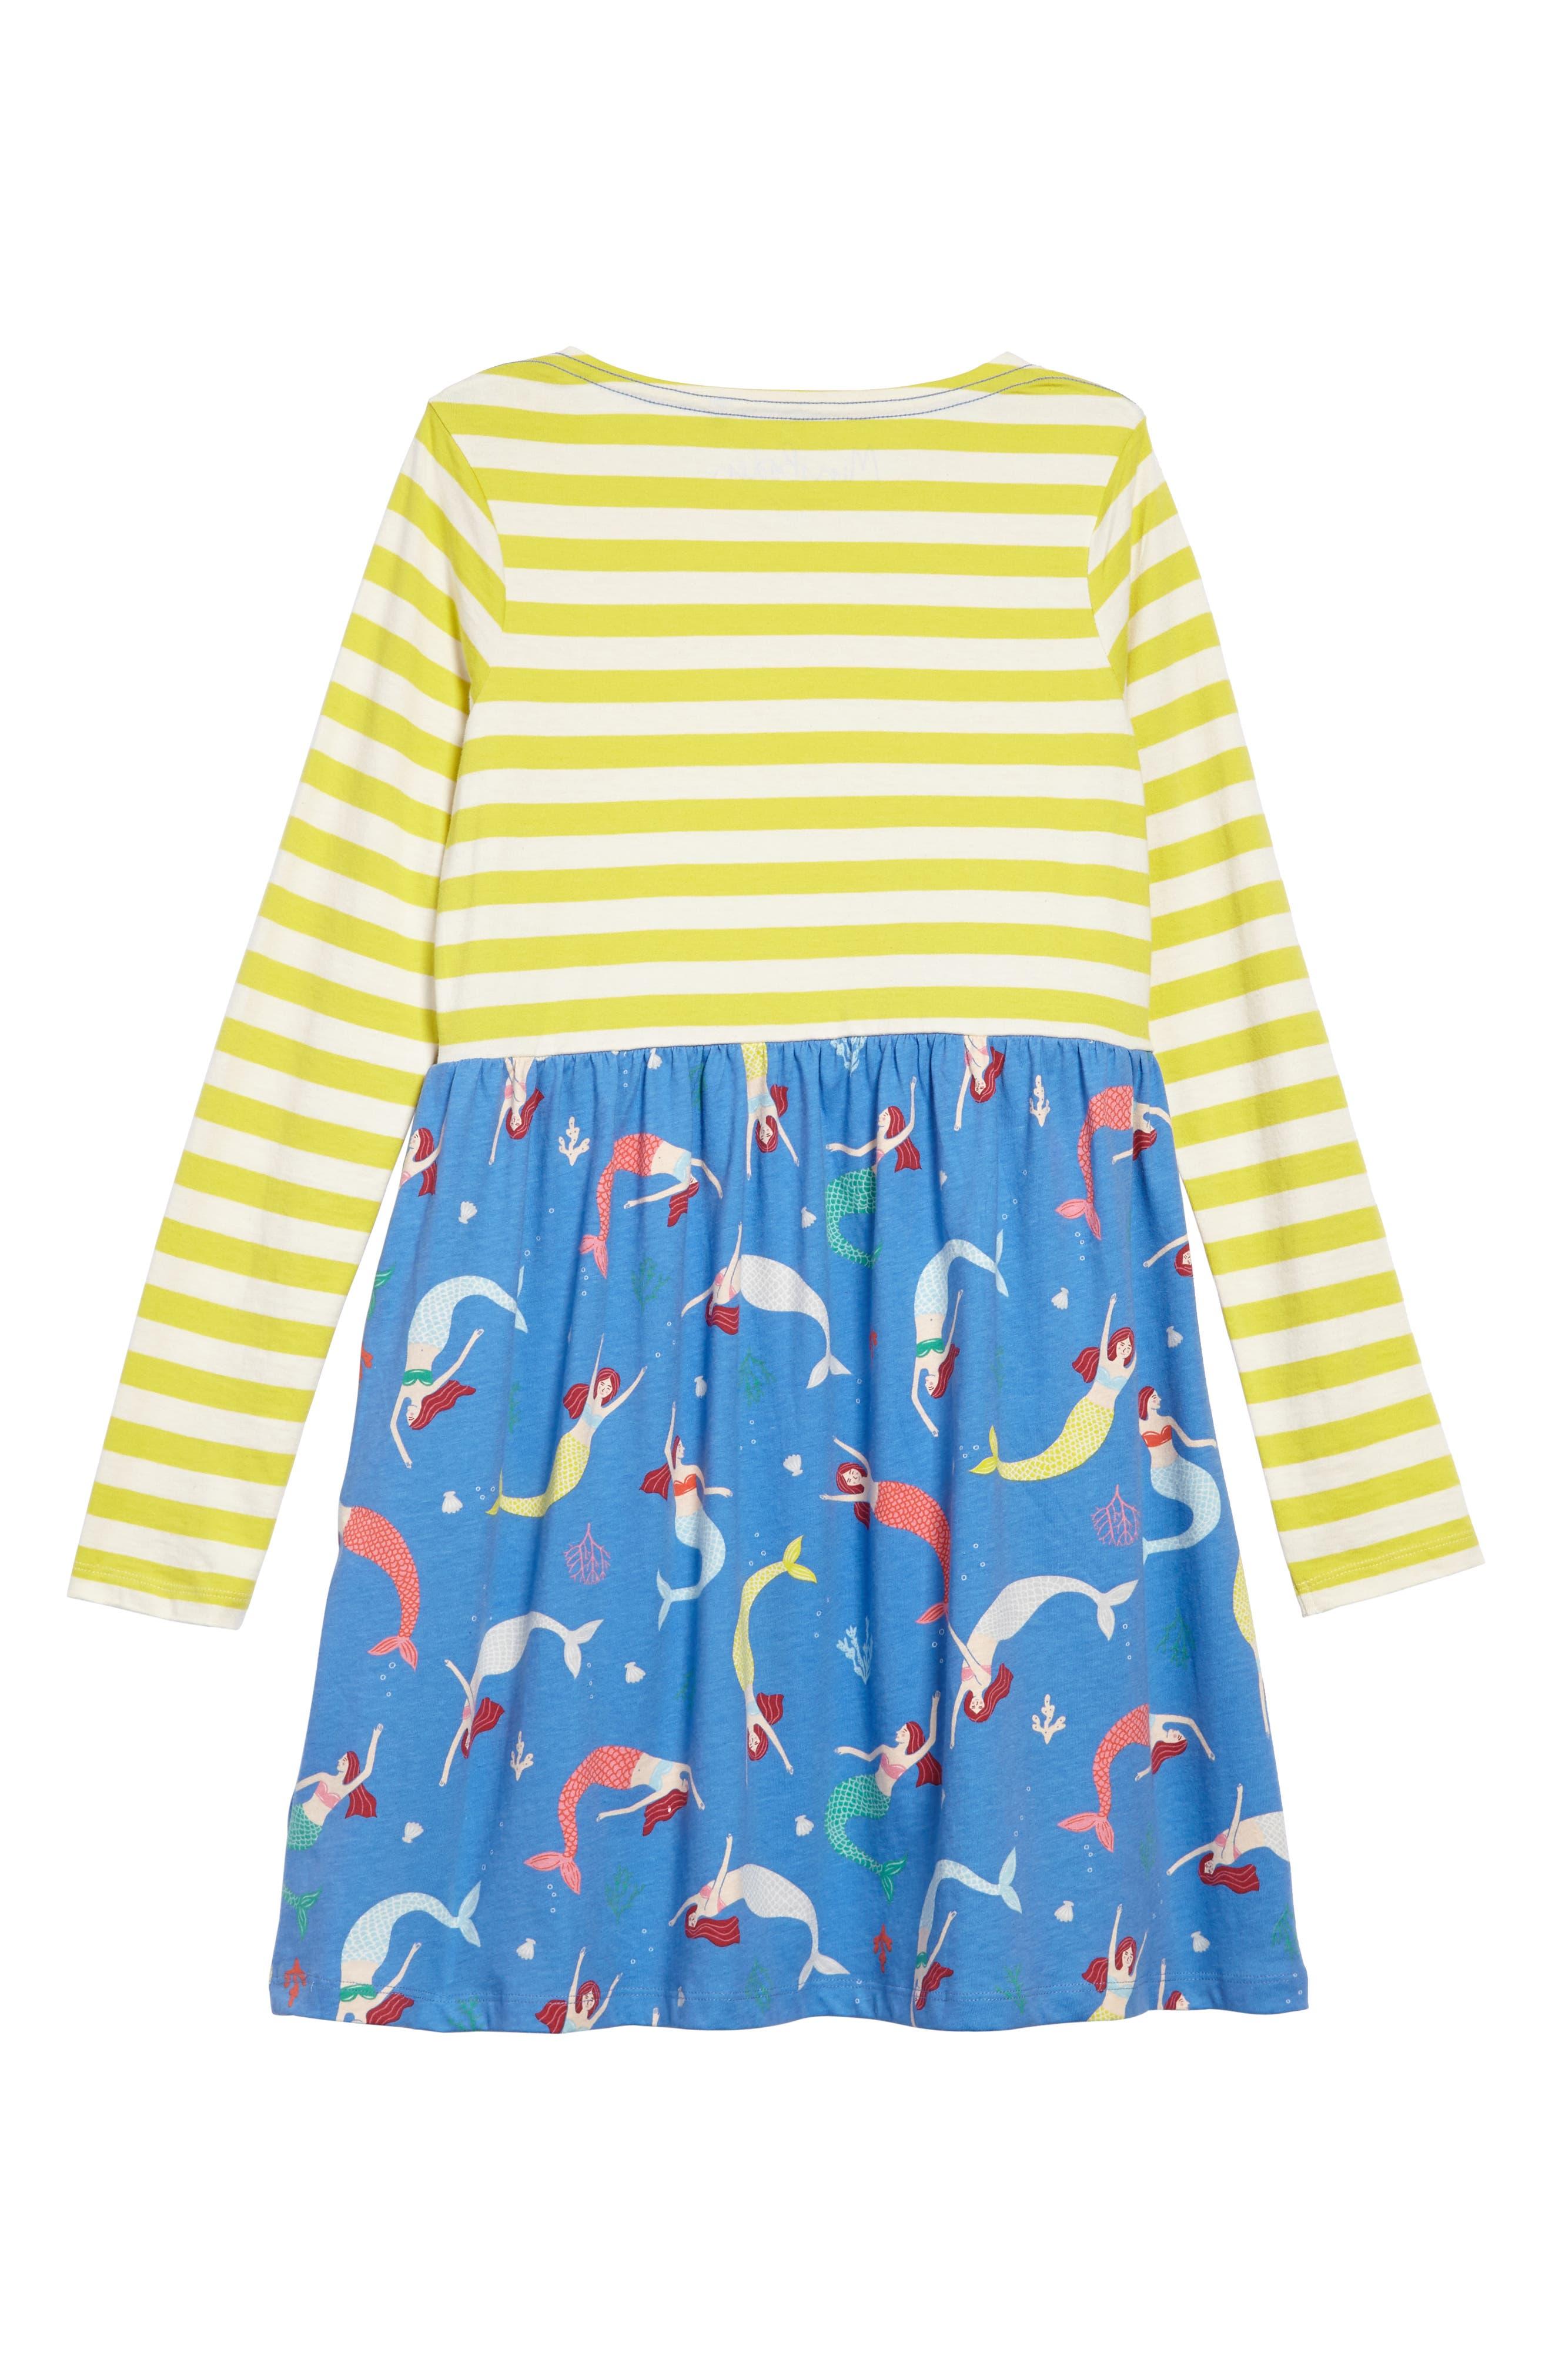 Hotchpotch Jersey Dress,                             Alternate thumbnail 6, color,